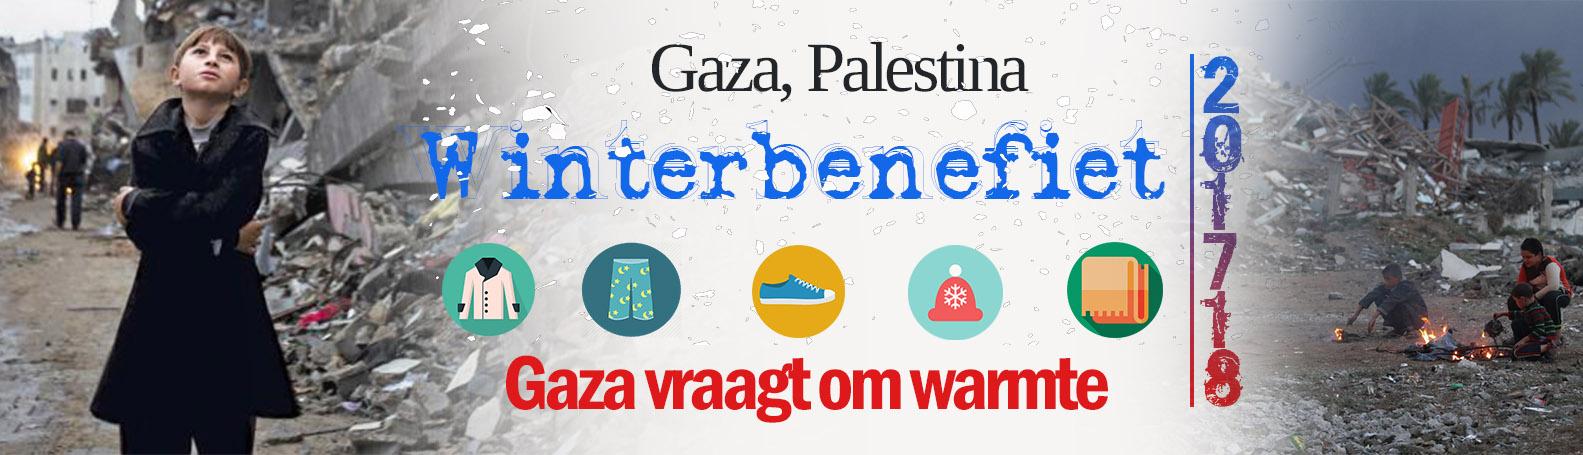 Palestina banner formaat